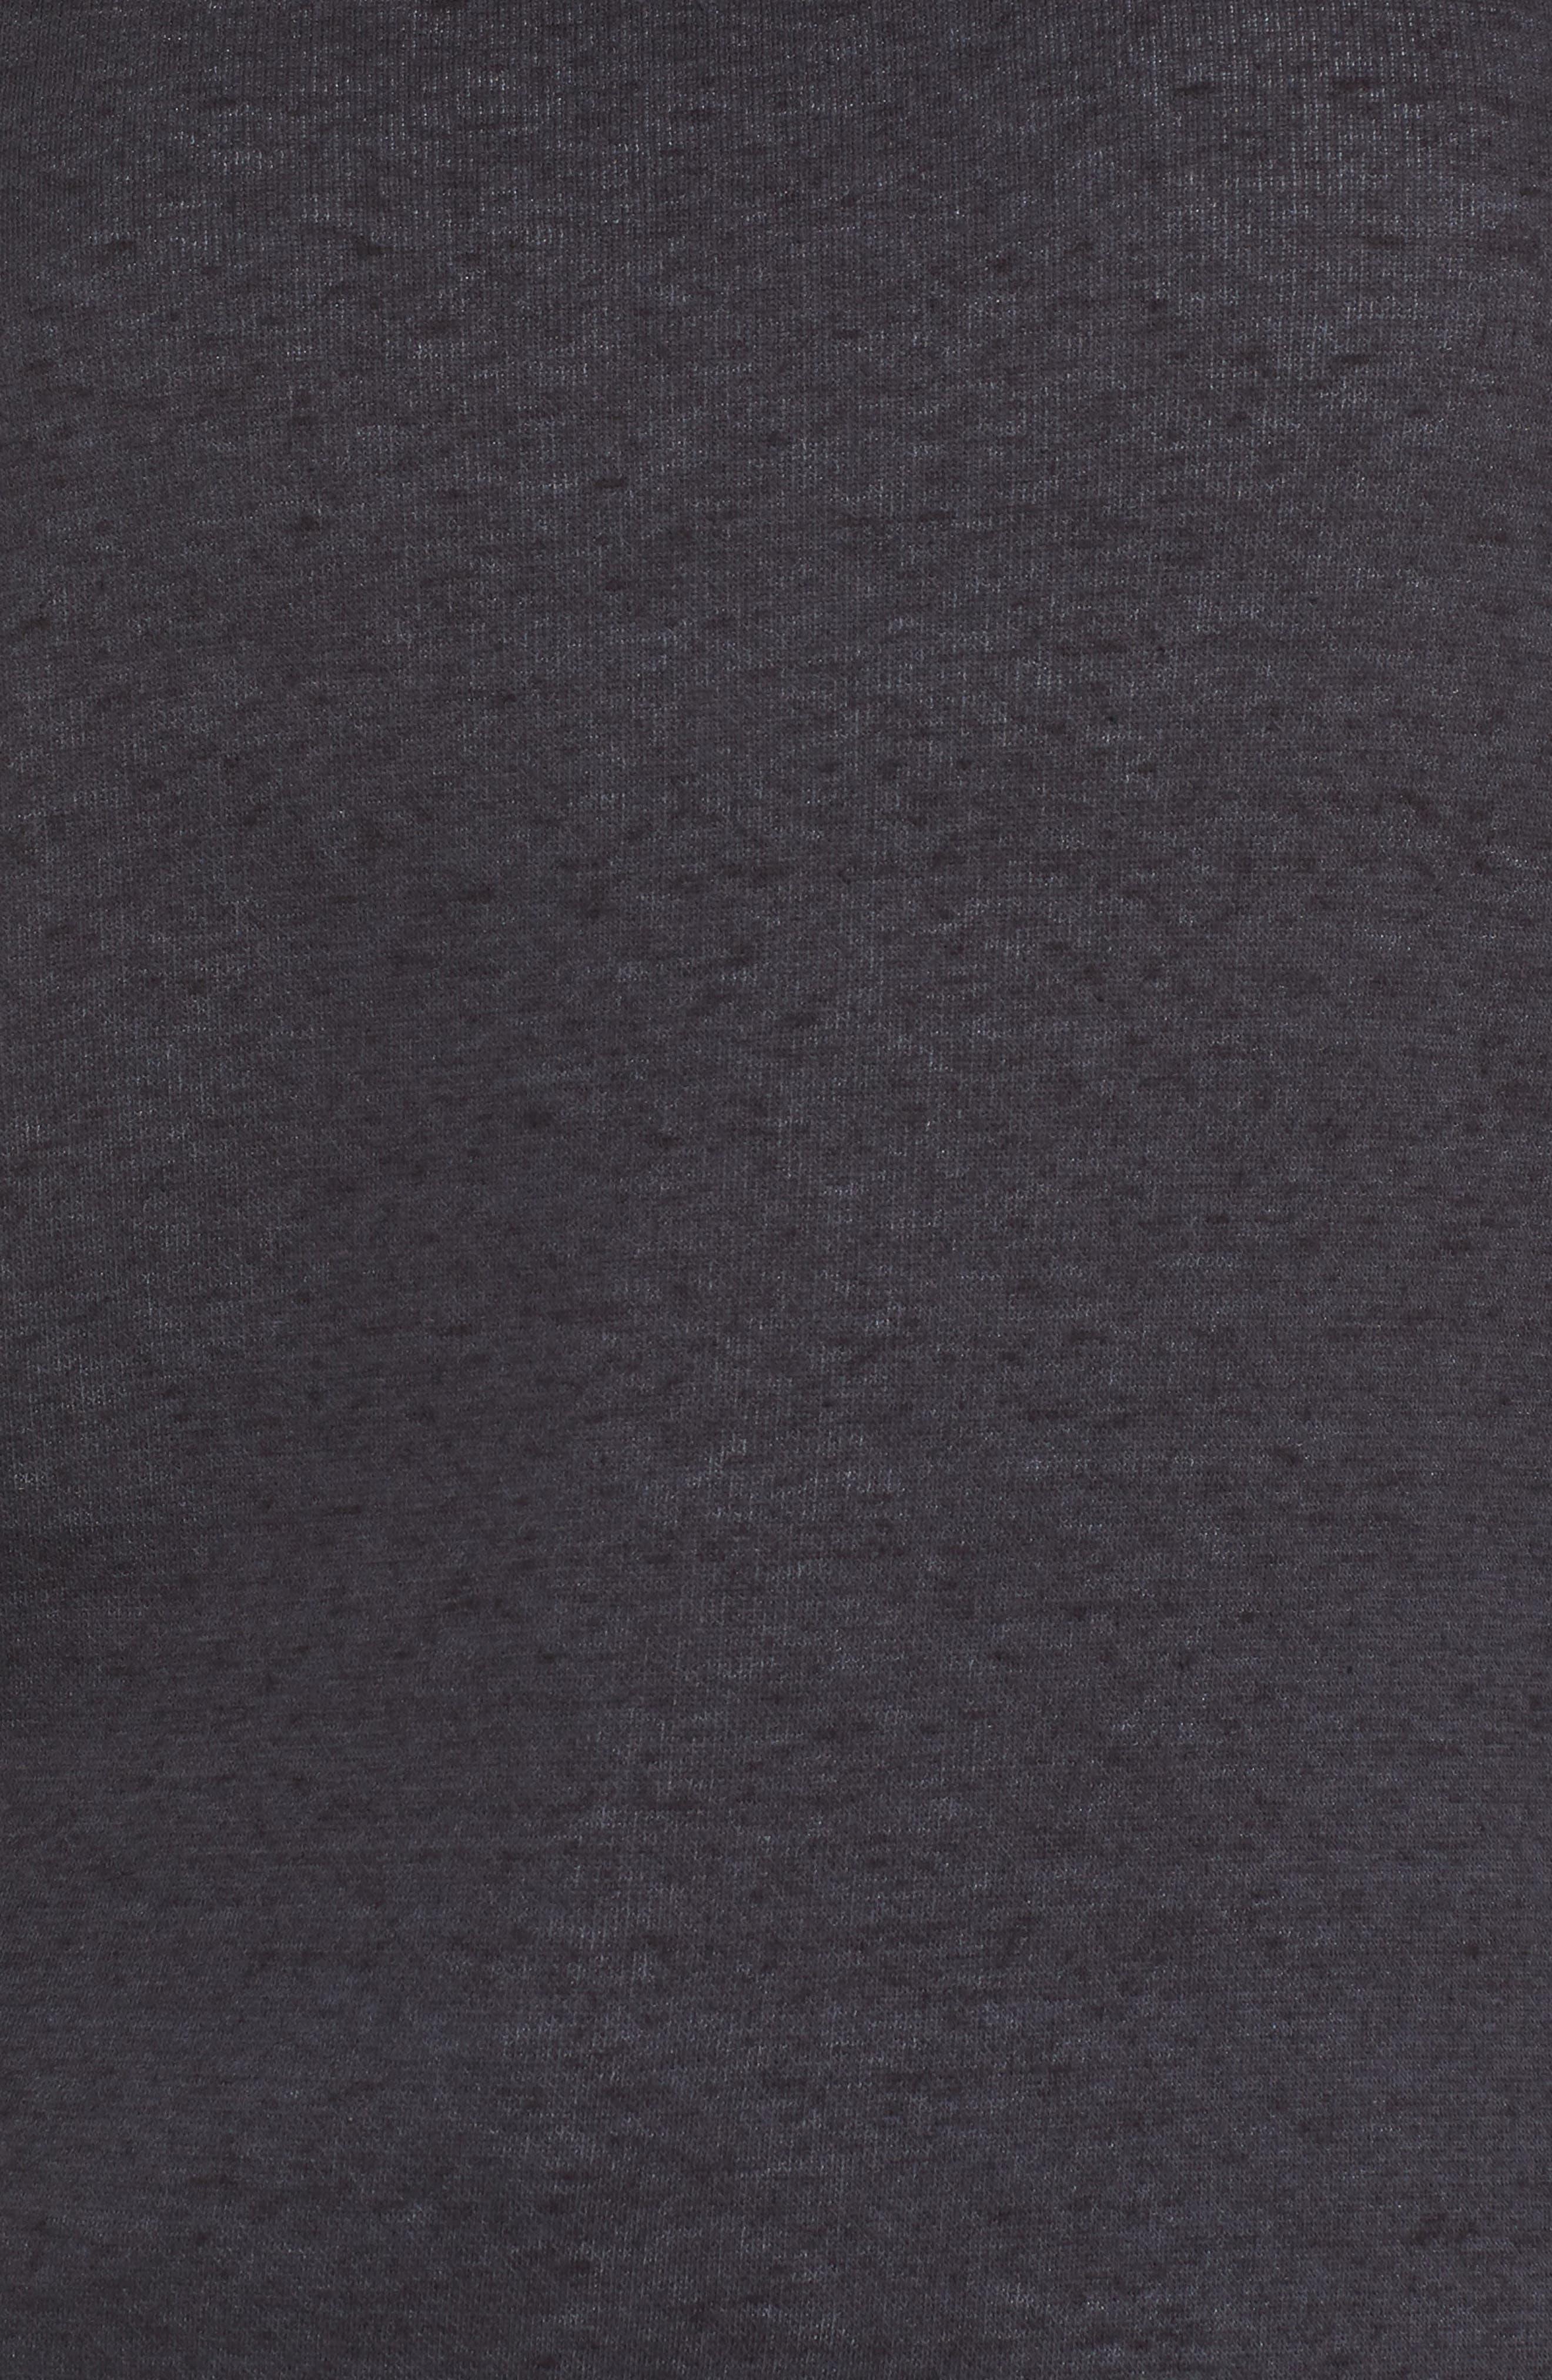 Morgan Sweatshirt,                             Alternate thumbnail 5, color,                             BLACK HEATHER